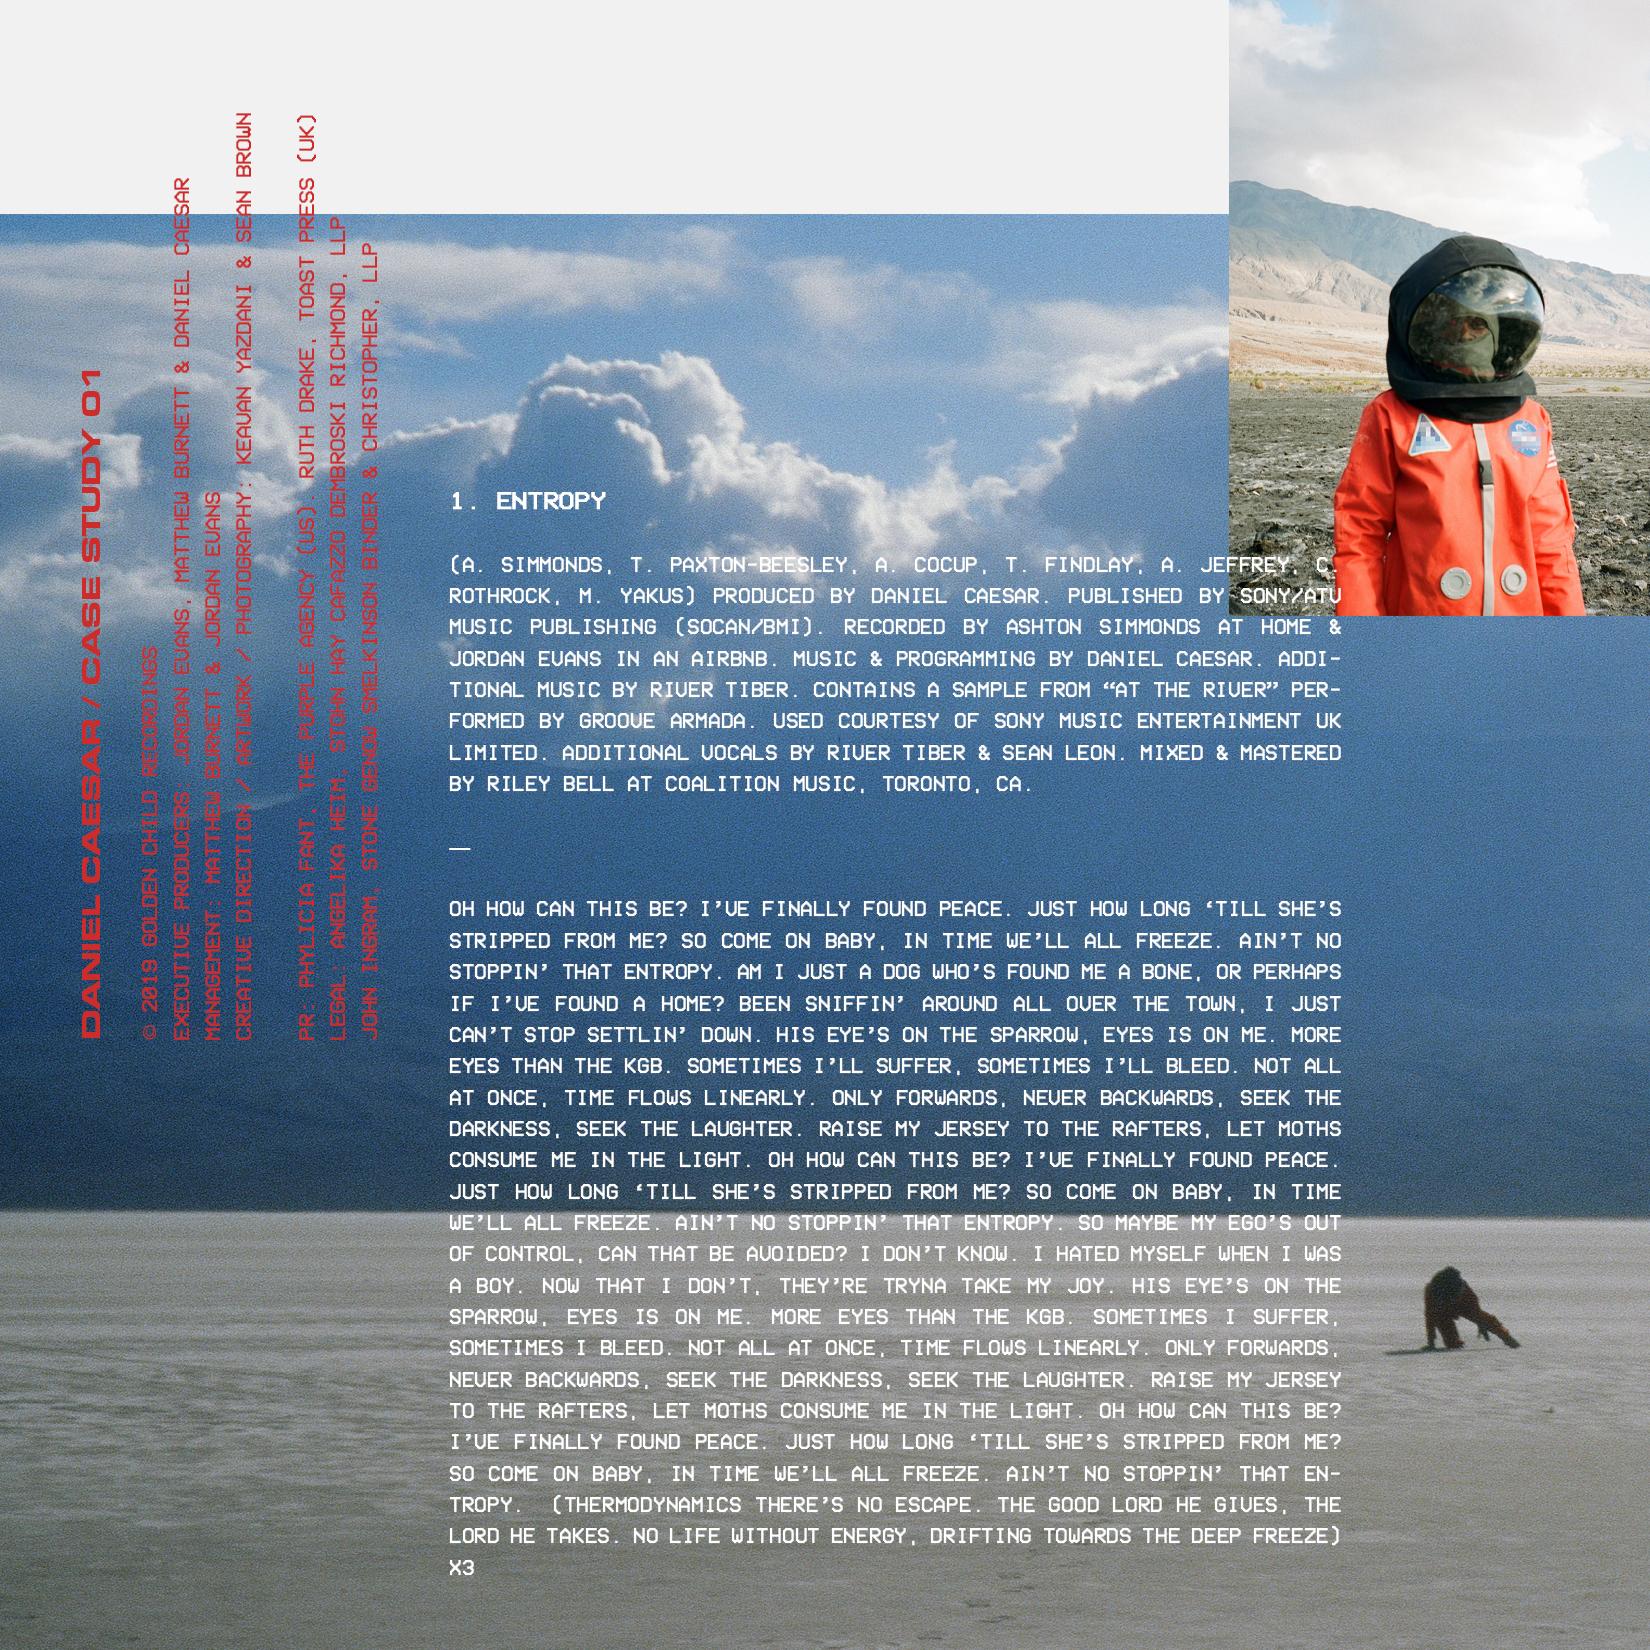 casestudy-linernotes-PG-02.jpg